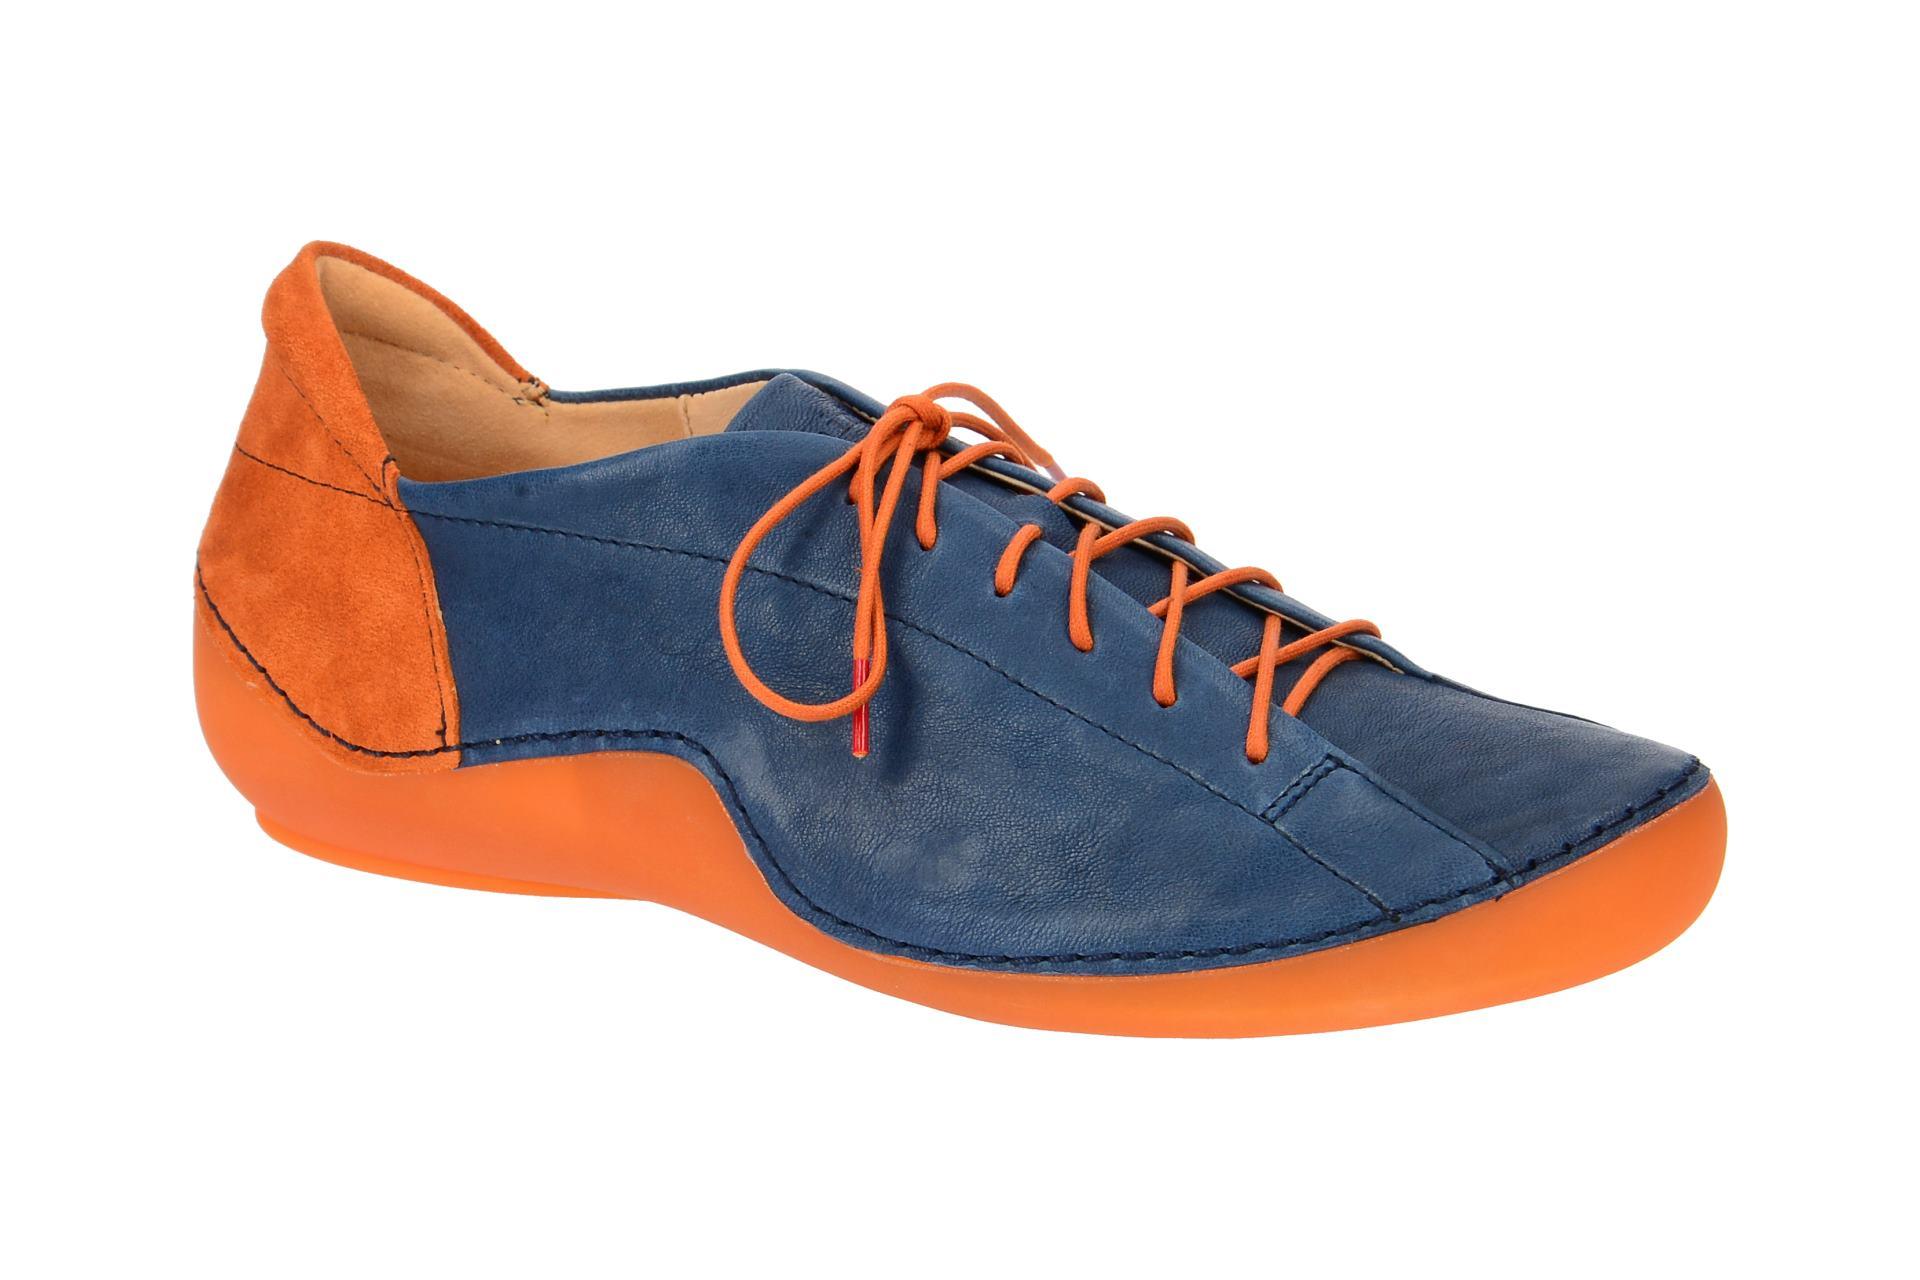 849d2f287f62cd Think Schuhe KAPSL blau Damenschuhe sportliche Schnür-Halbschuhe 2-82062-90  NEU